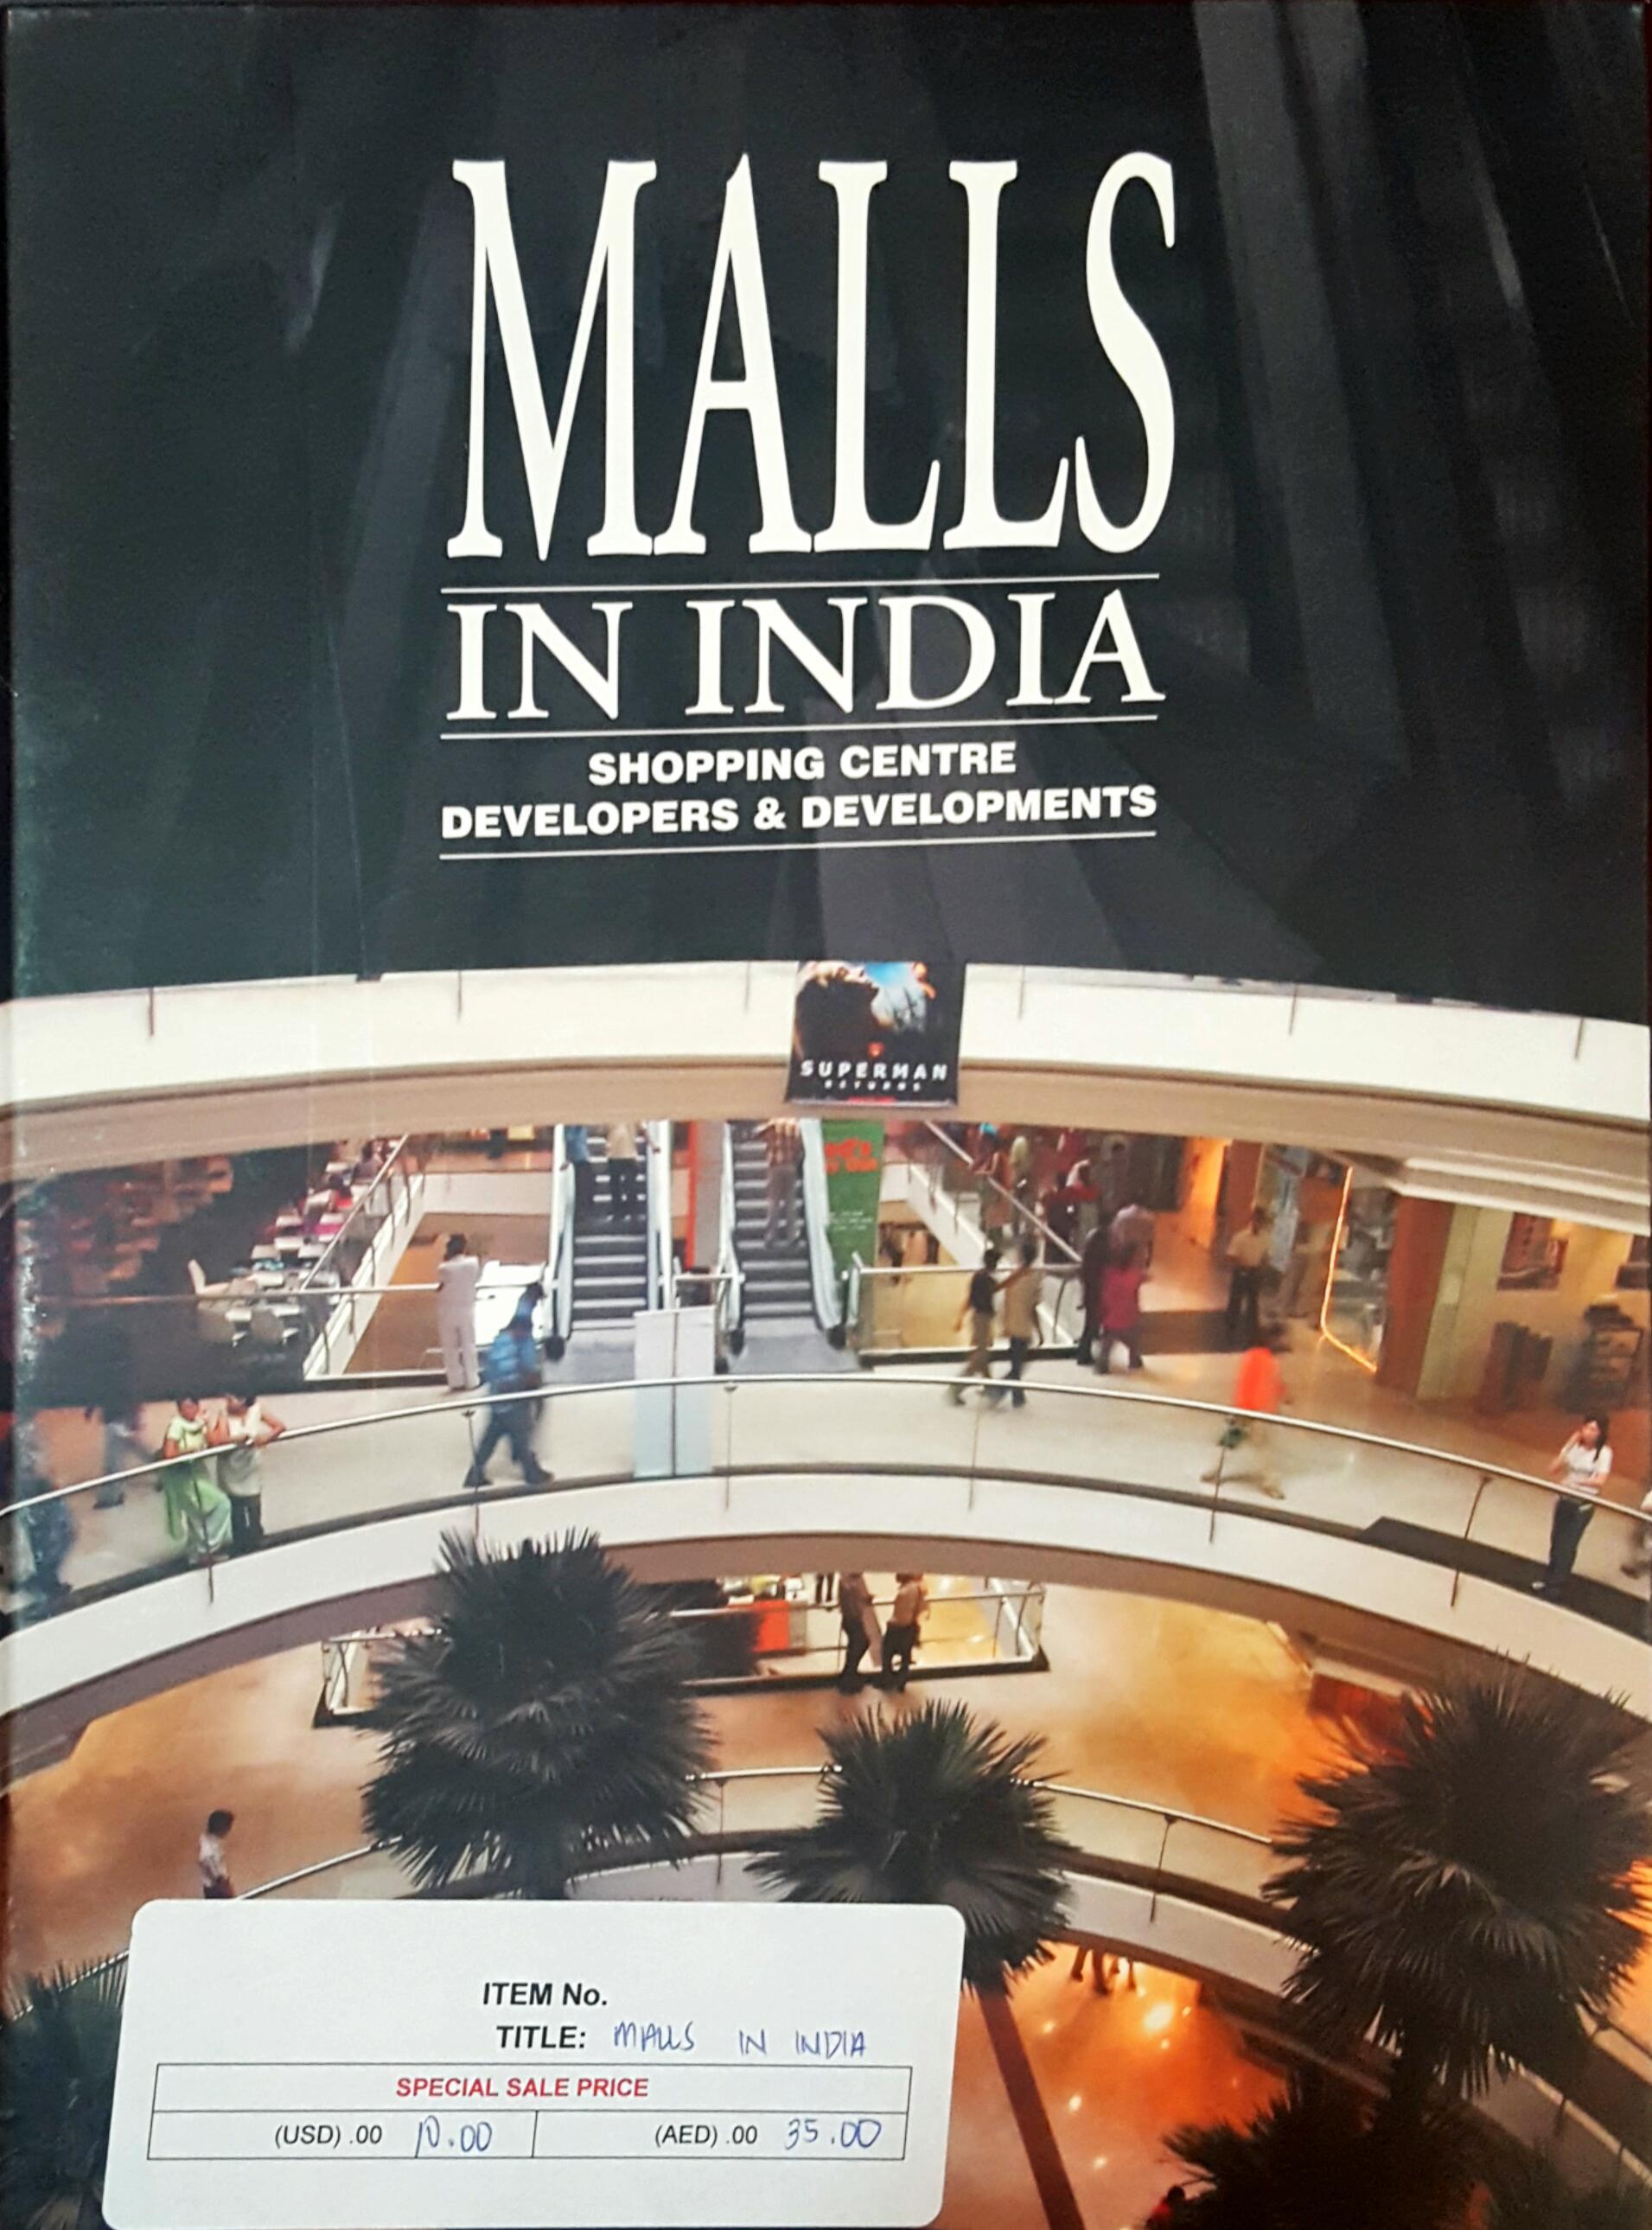 Shopping Center Marketing